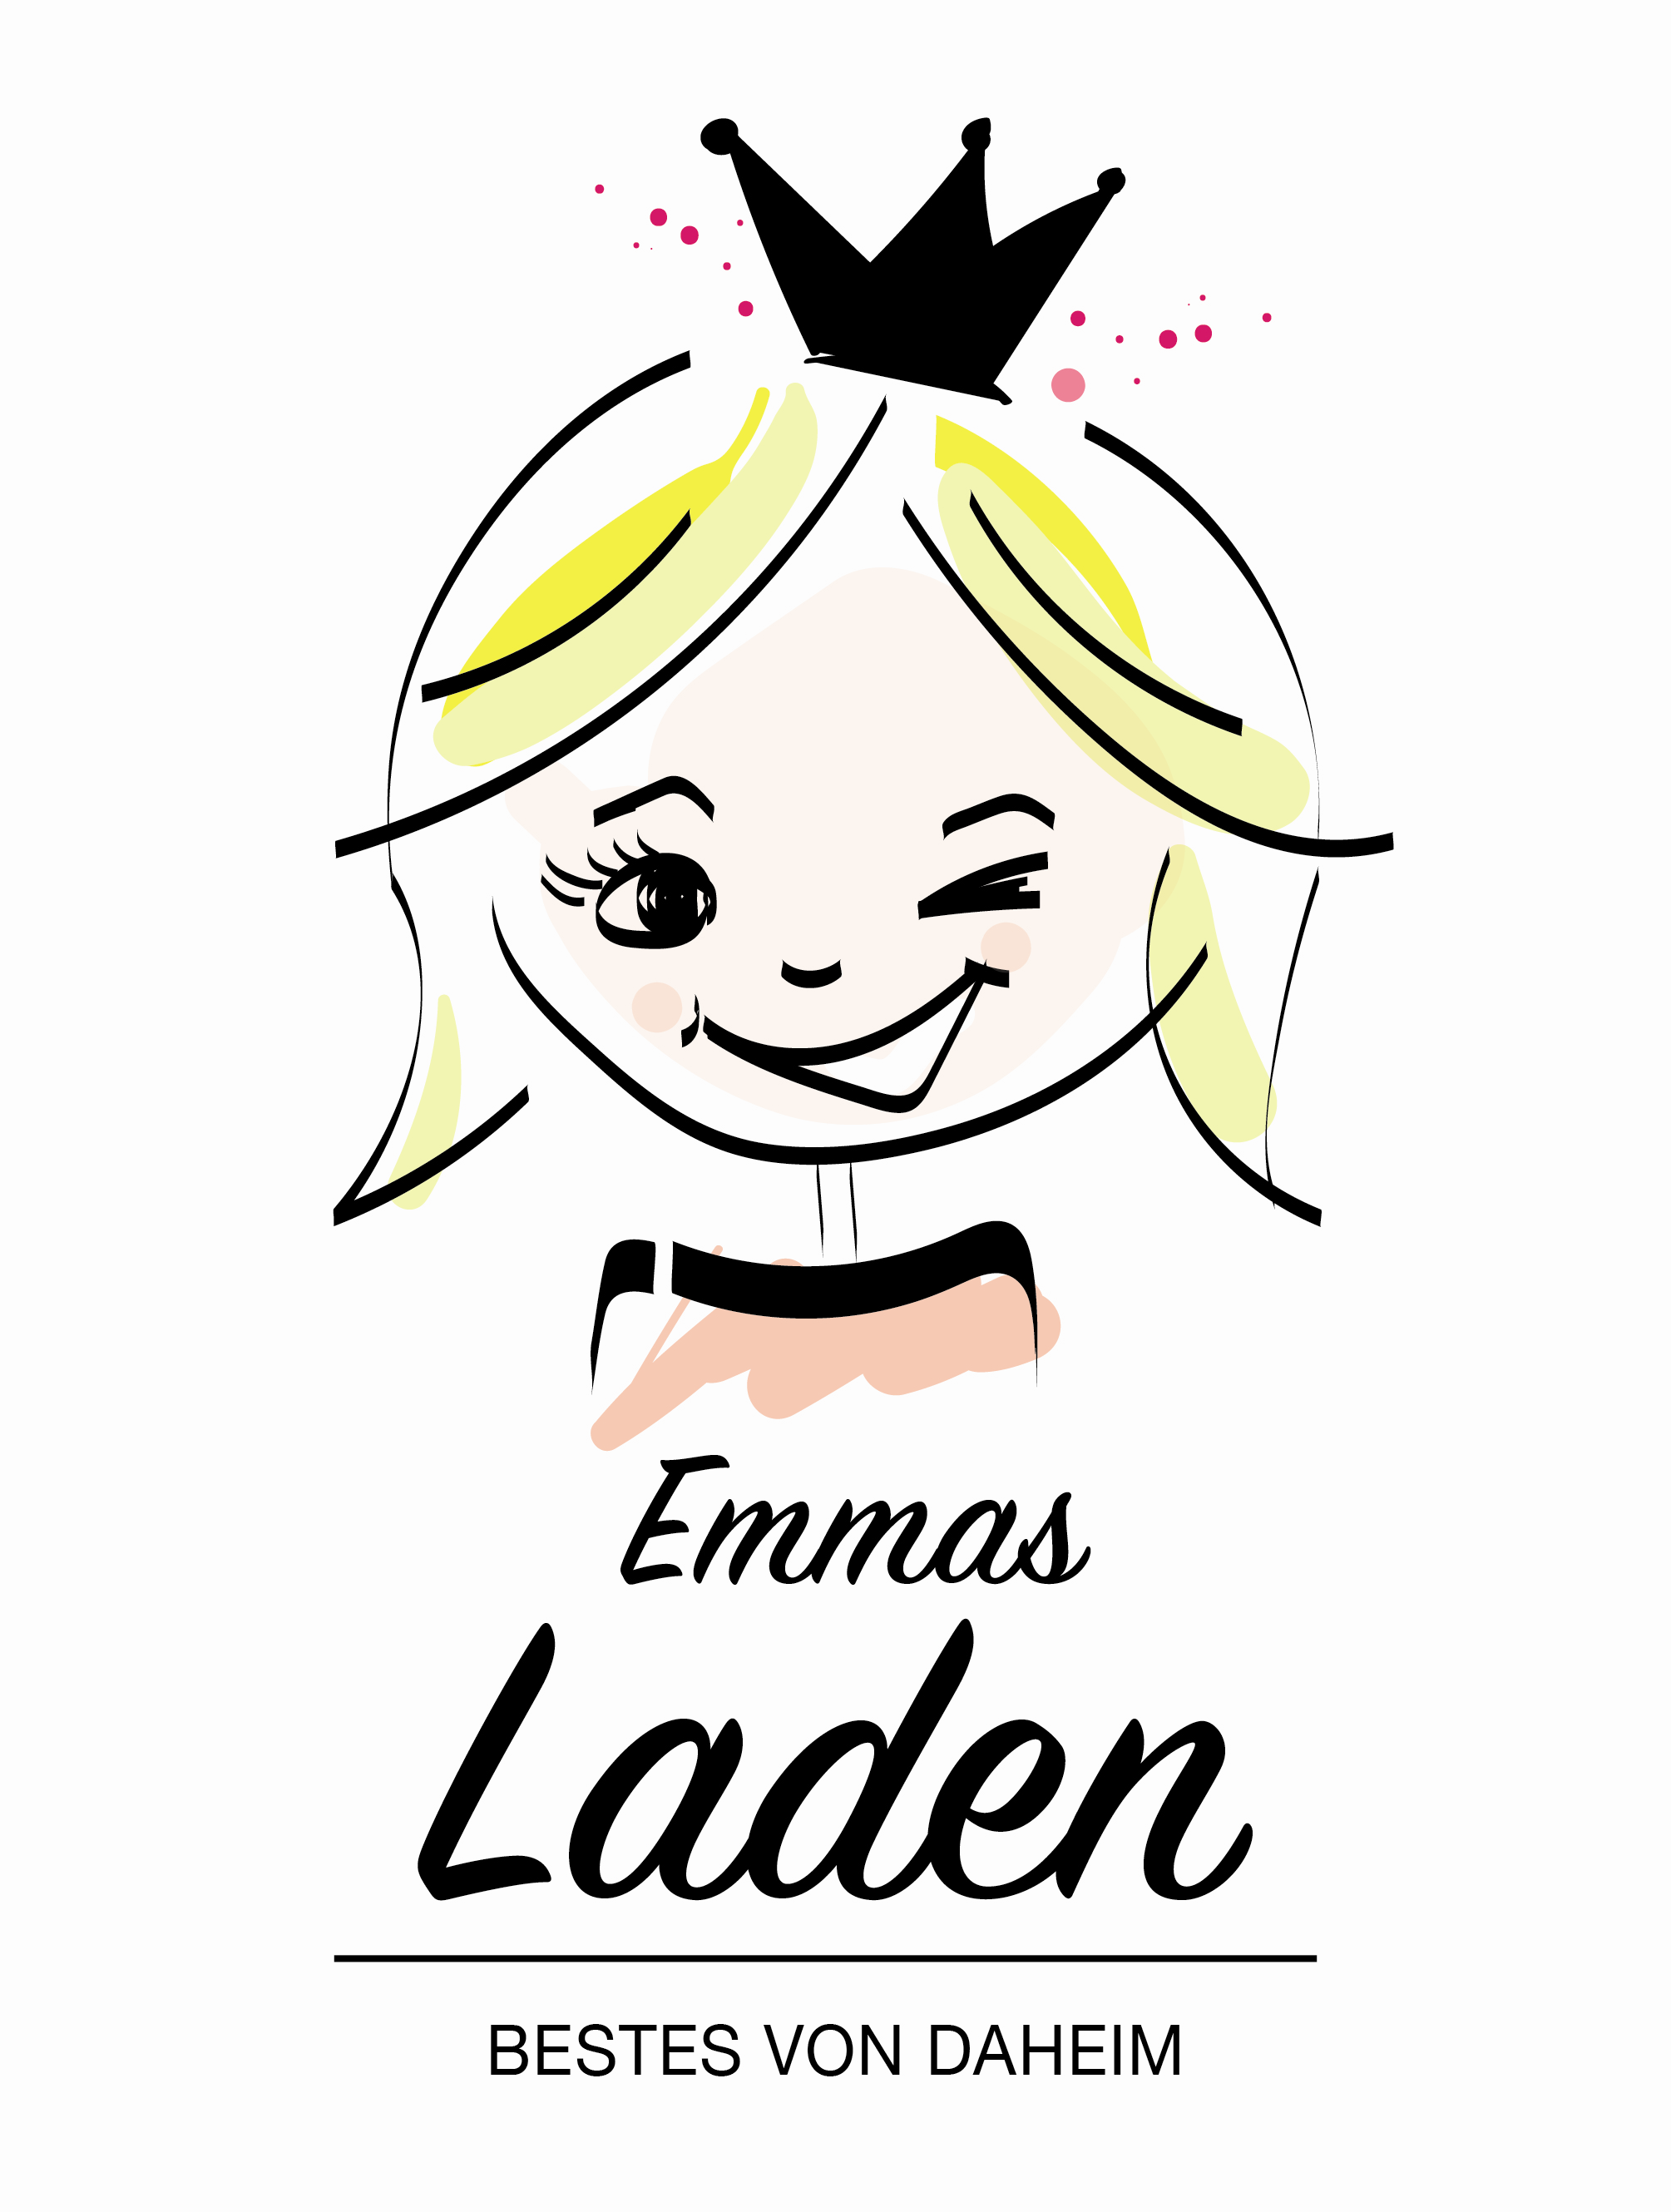 Emmas_Logo_Laden_FINAL.PNG